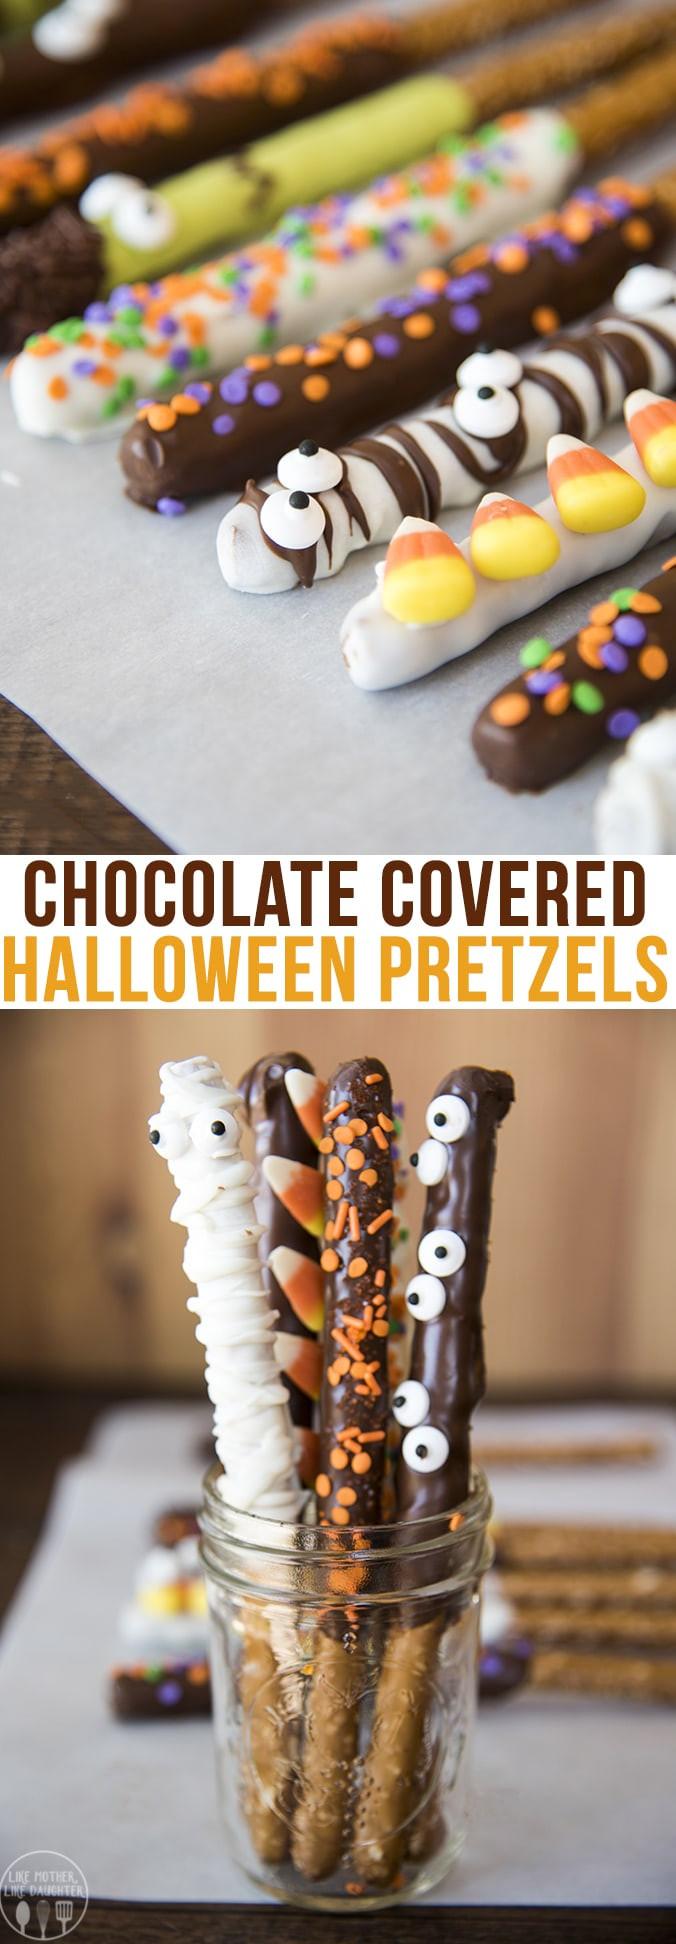 Halloween Chocolate Covered Pretzels  Chocolate Covered Halloween Pretzels – Like Mother Like